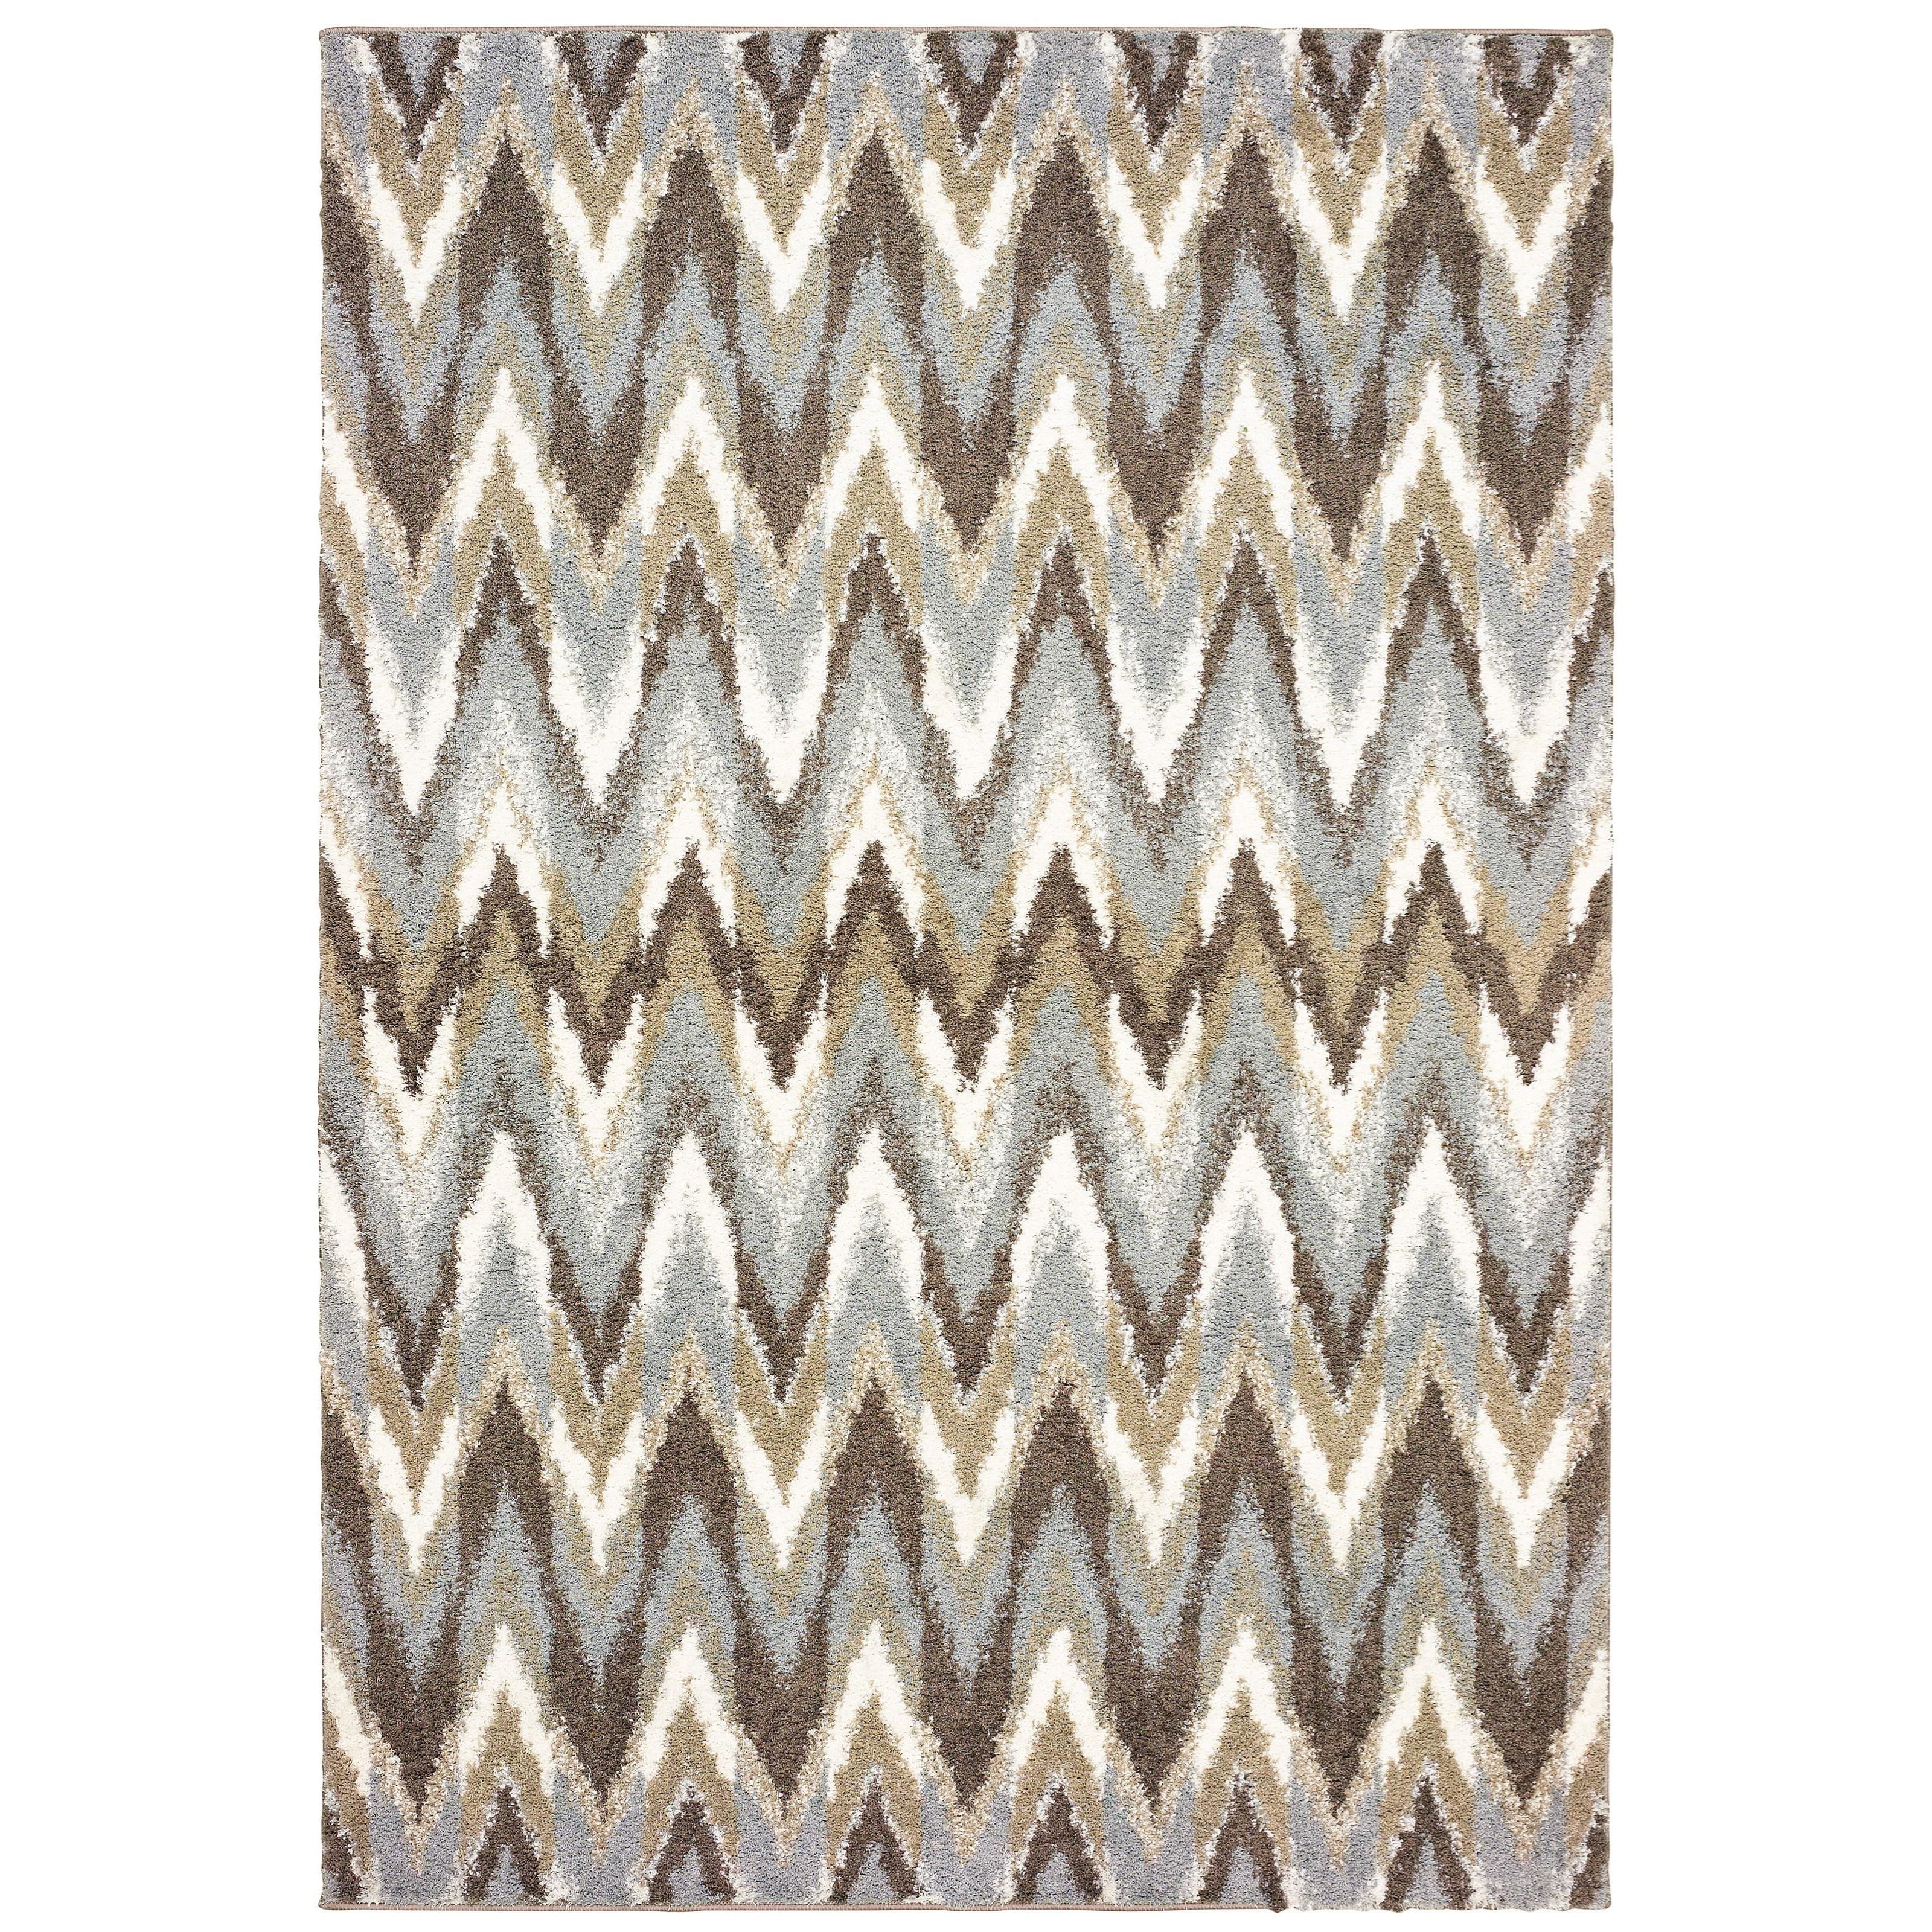 "Verona 7'10"" X 10'10"" Rug by Oriental Weavers at HomeWorld Furniture"